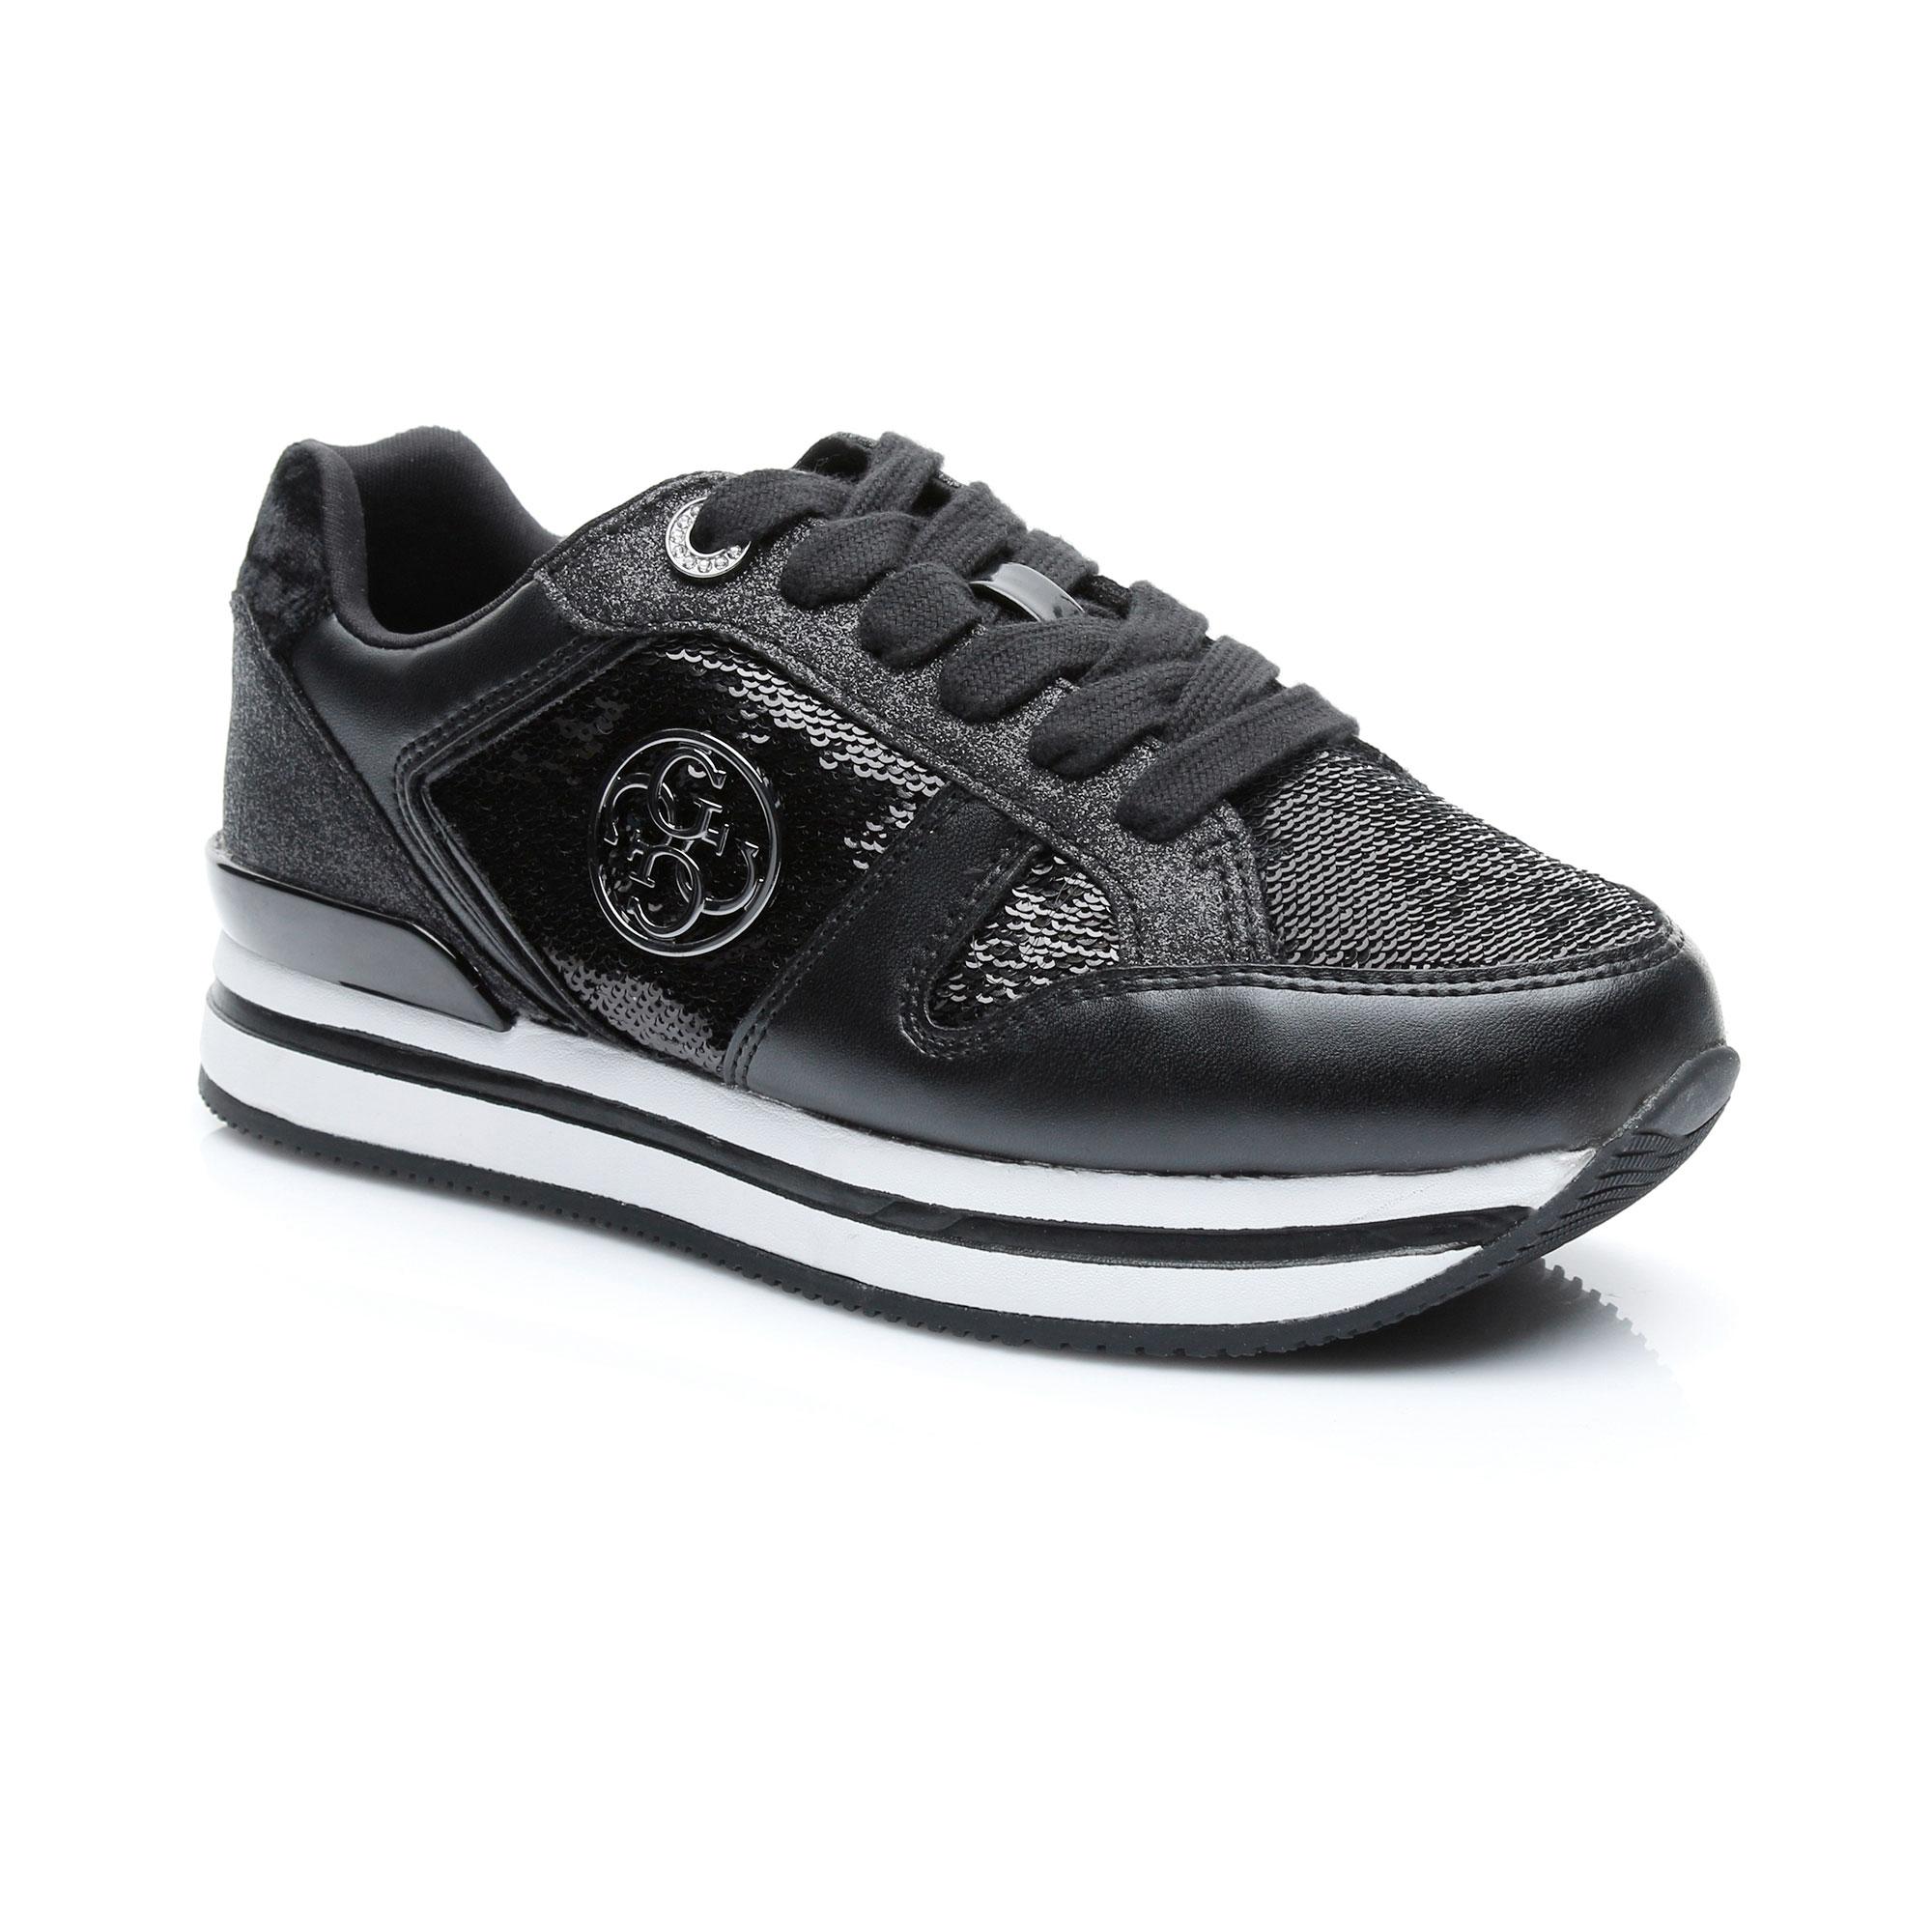 Guess Dameon5 Kadın Siyah Sneaker